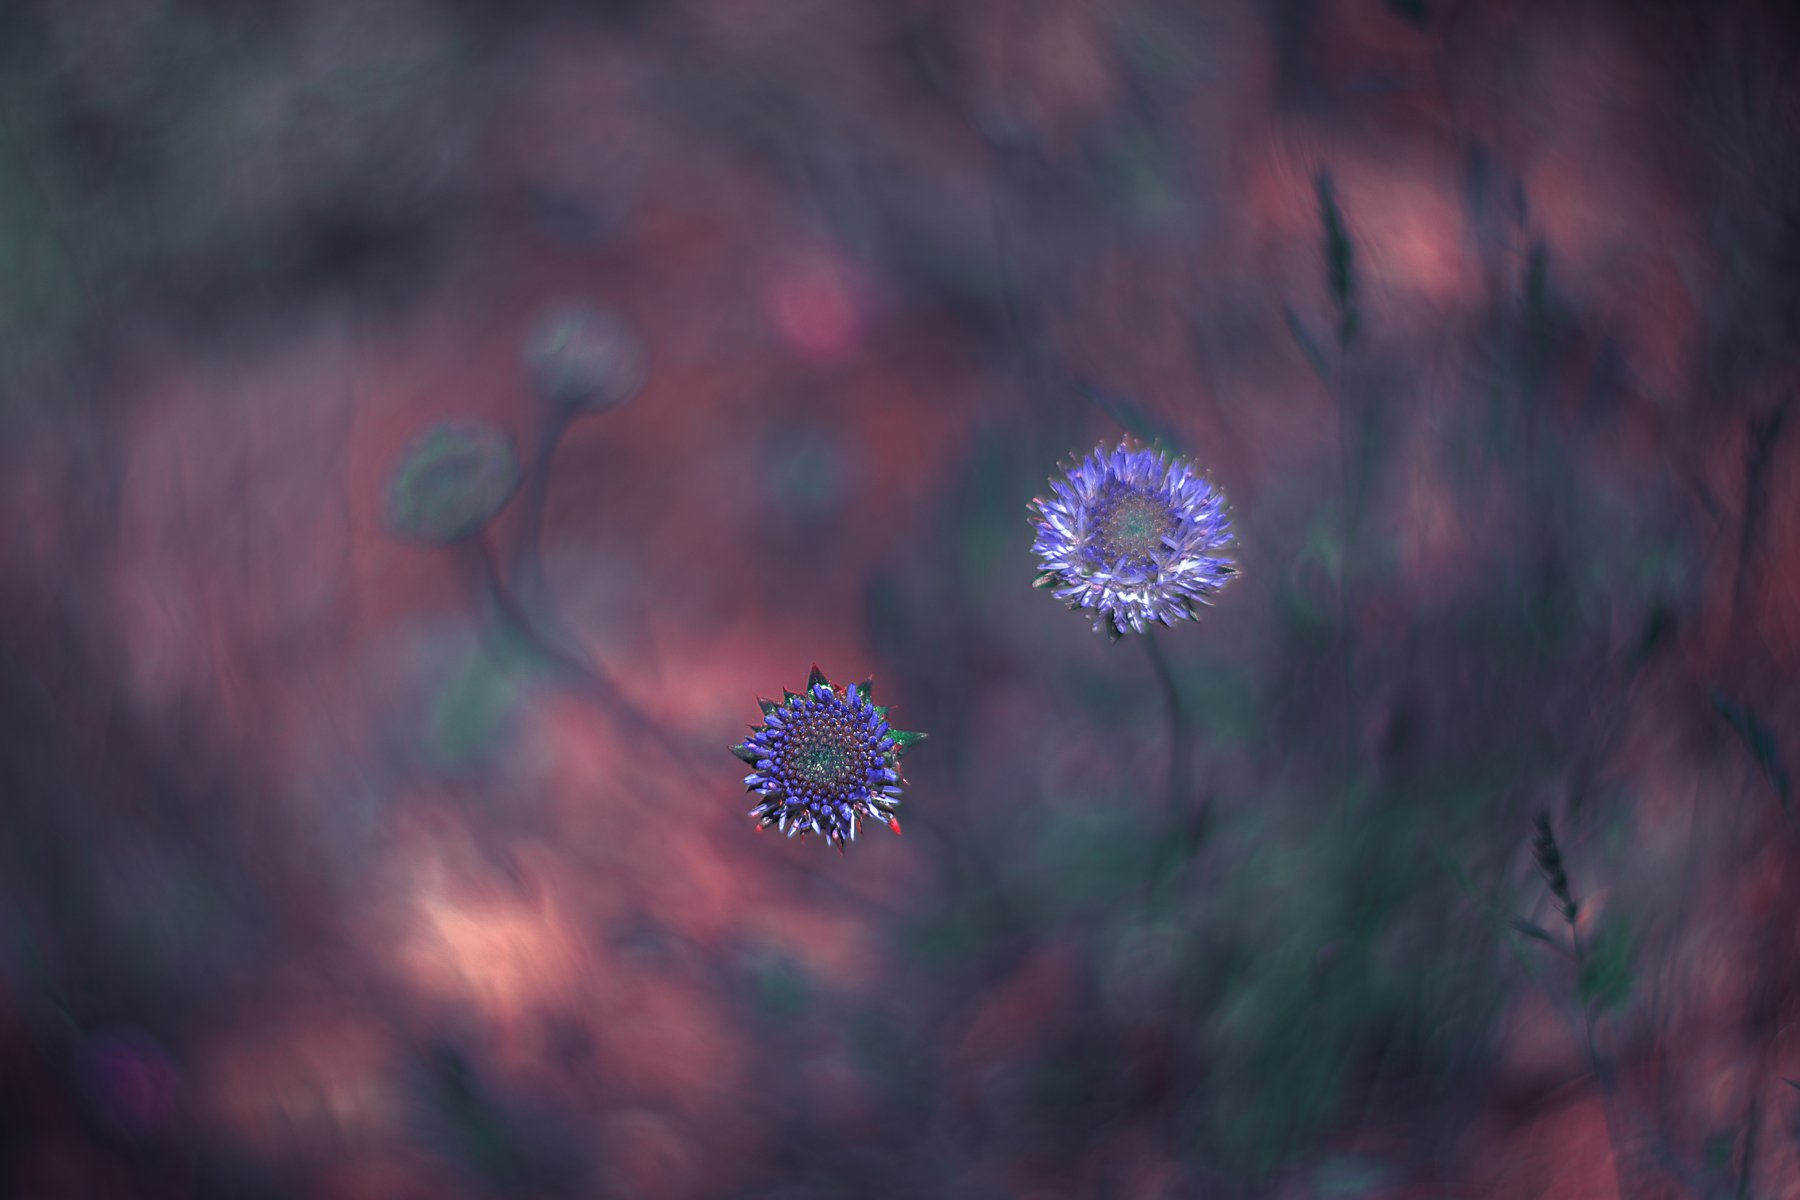 Bokeh,purple,light,pink,green,flowers,nikon,nature,, Борислав Алексиев